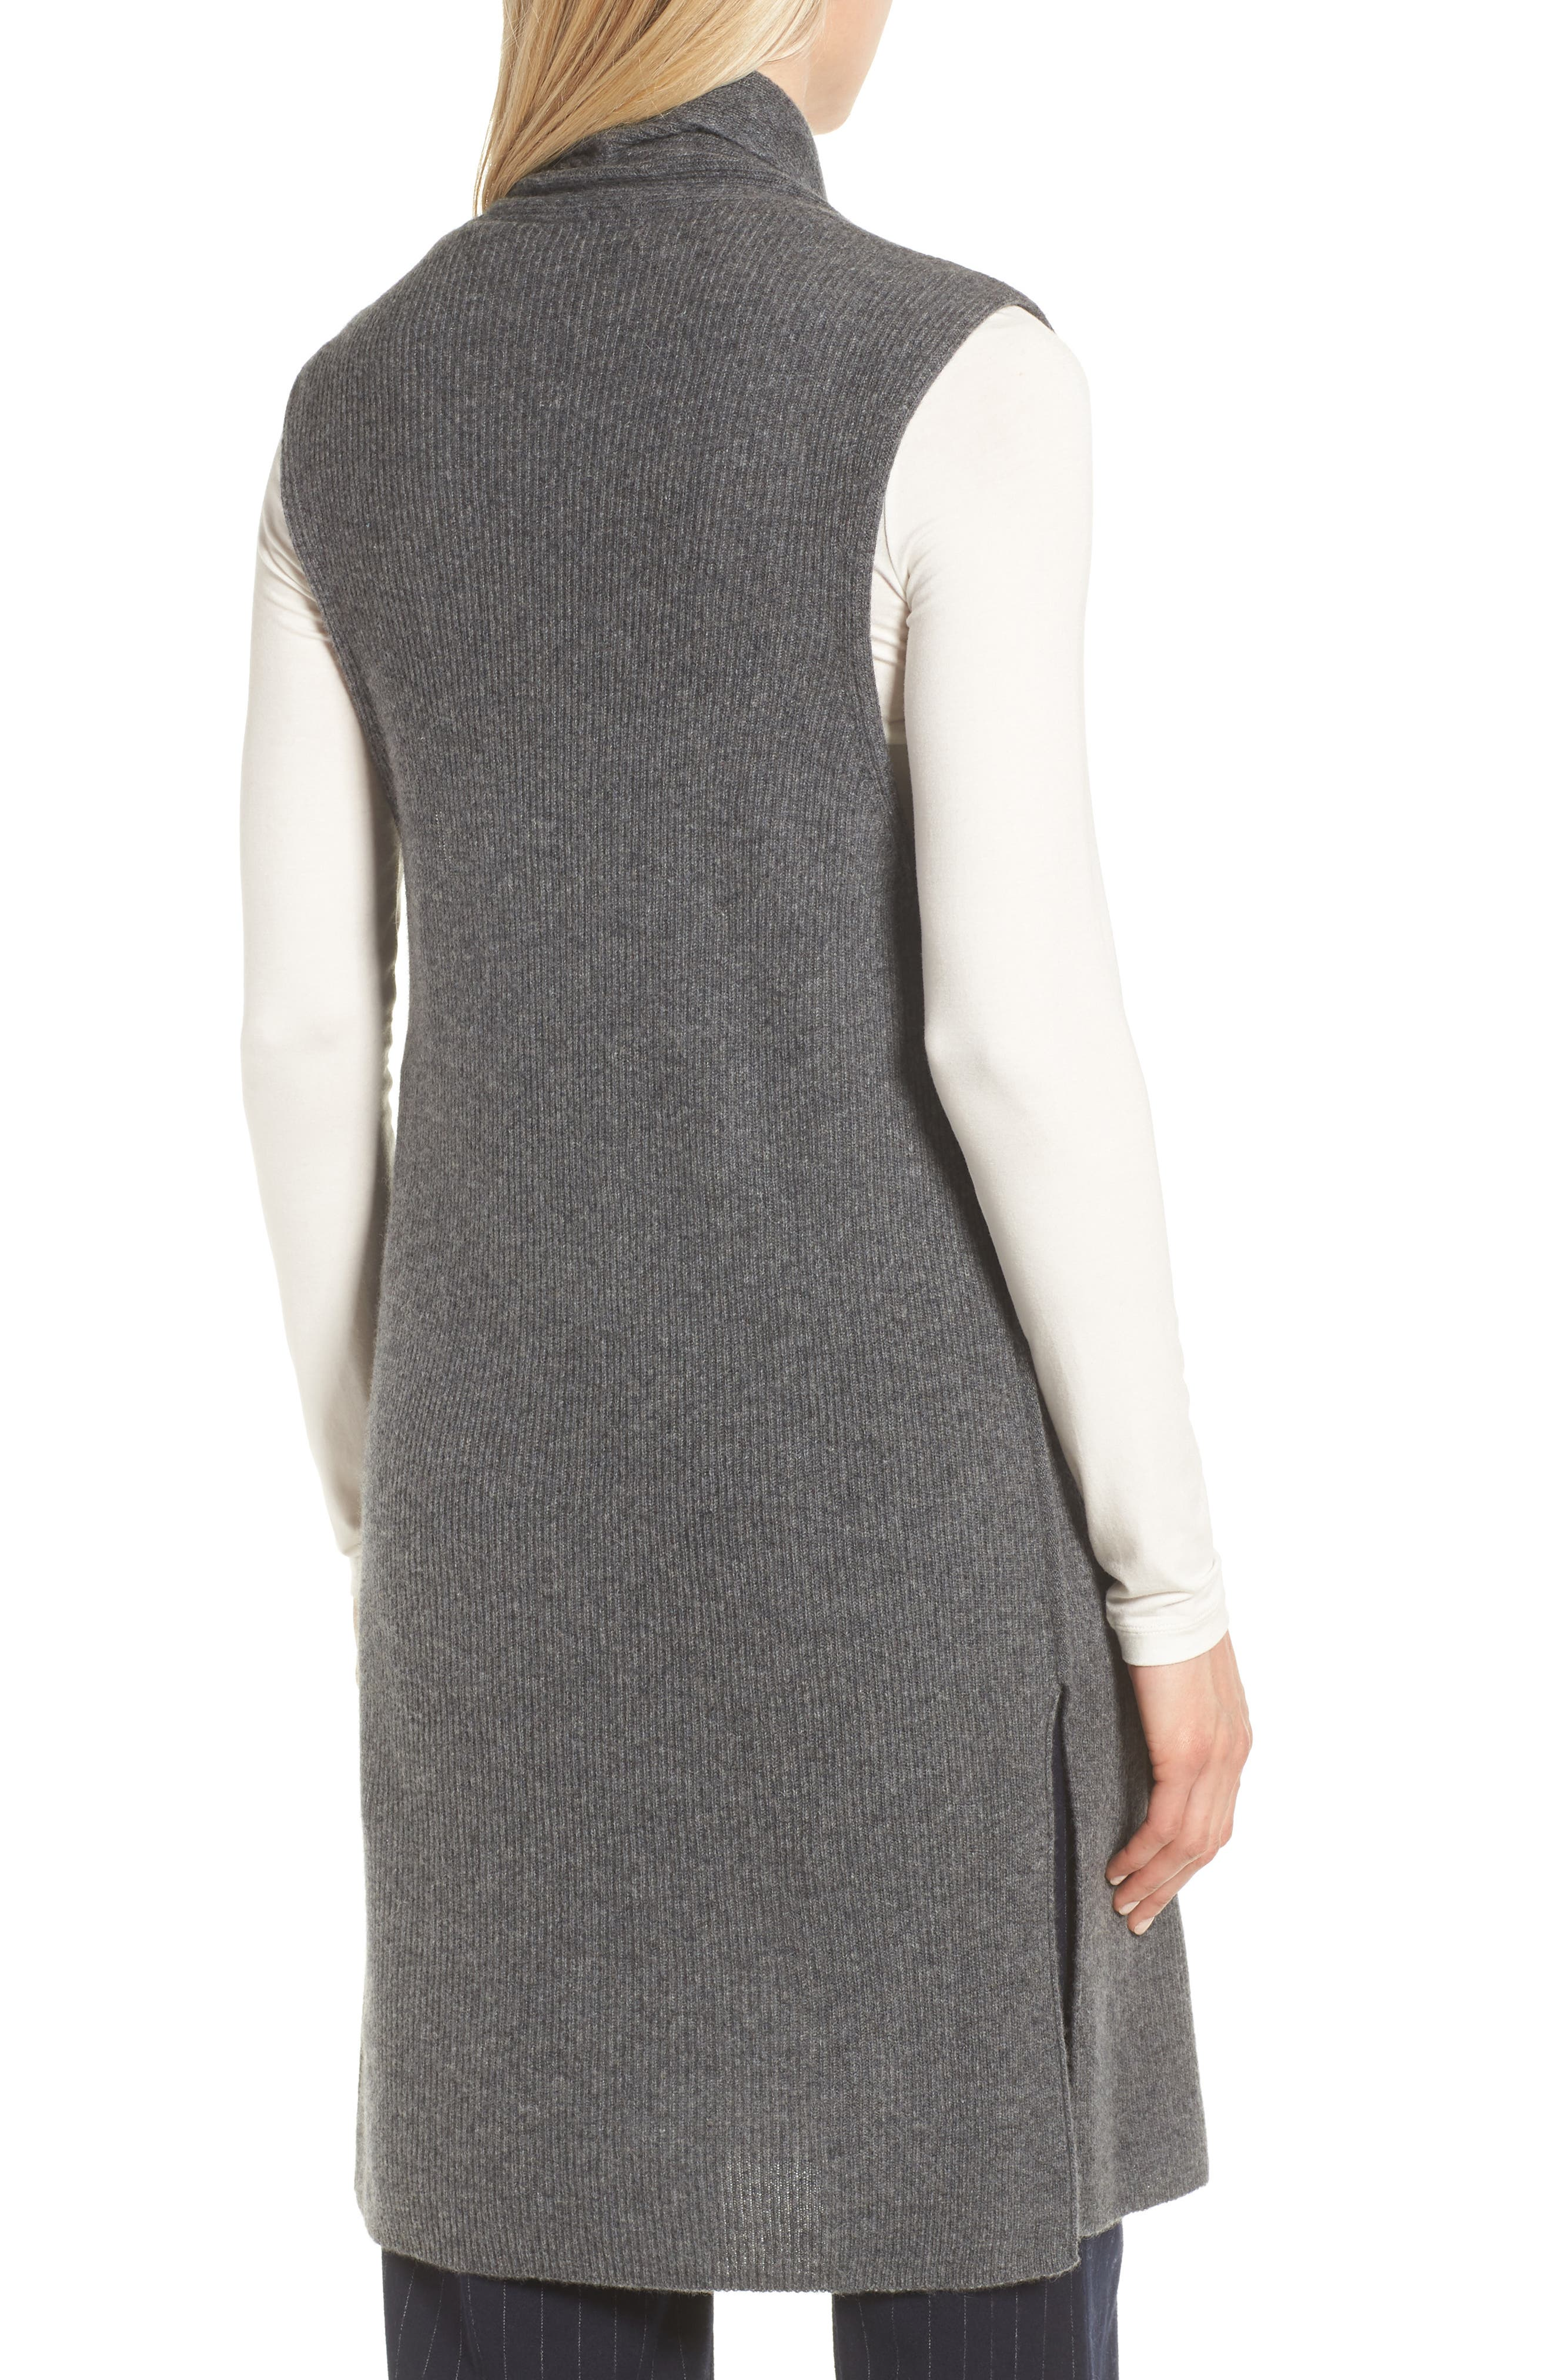 Ribbed Cashmere Vest,                             Alternate thumbnail 2, color,                             Grey Dark Heather